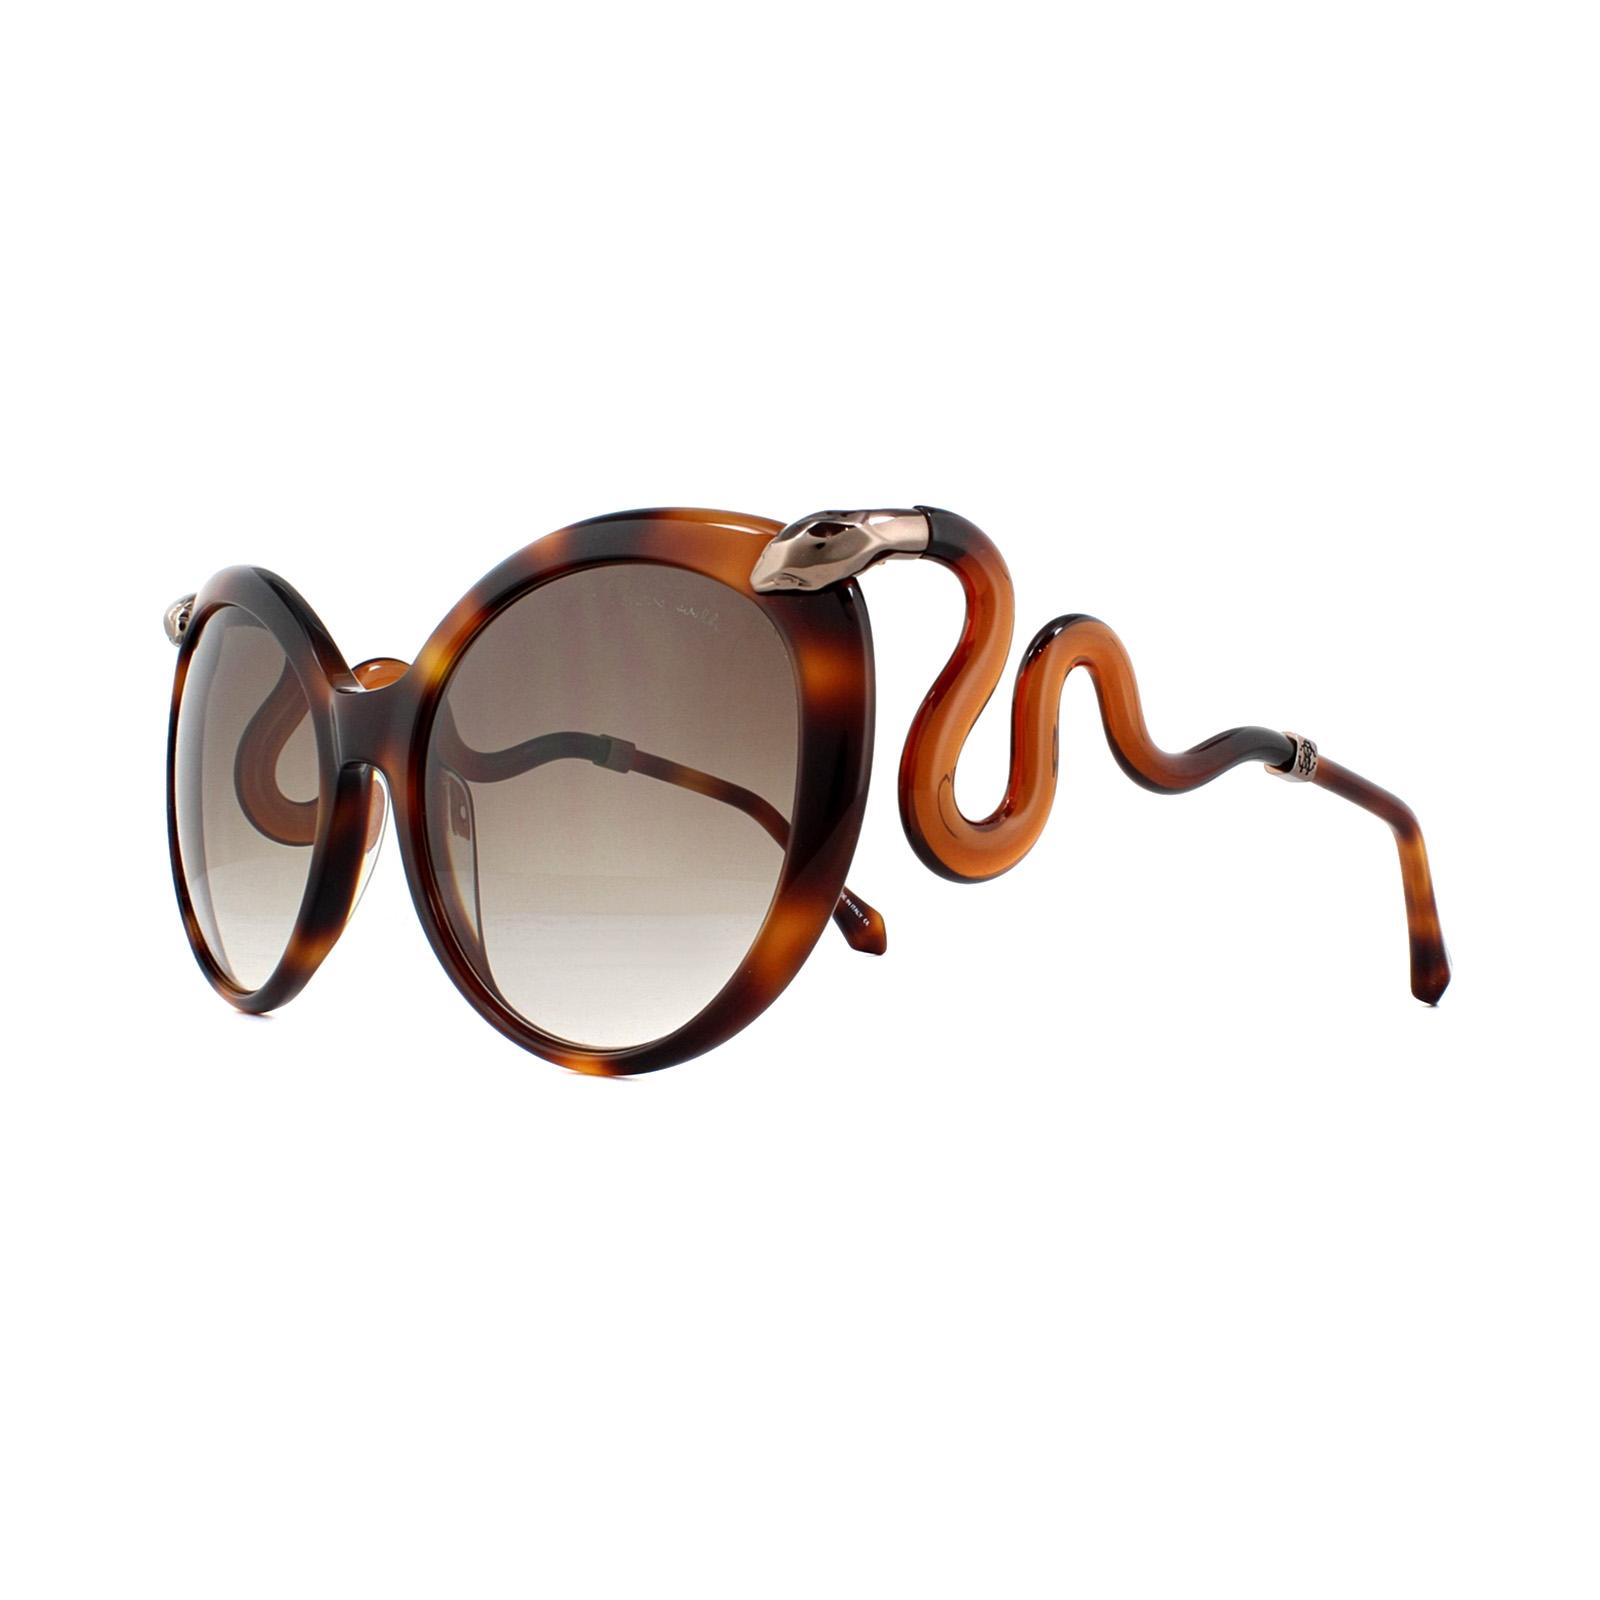 new products super popular amazing price Roberto Cavalli Sunglasses Ebay « Heritage Malta